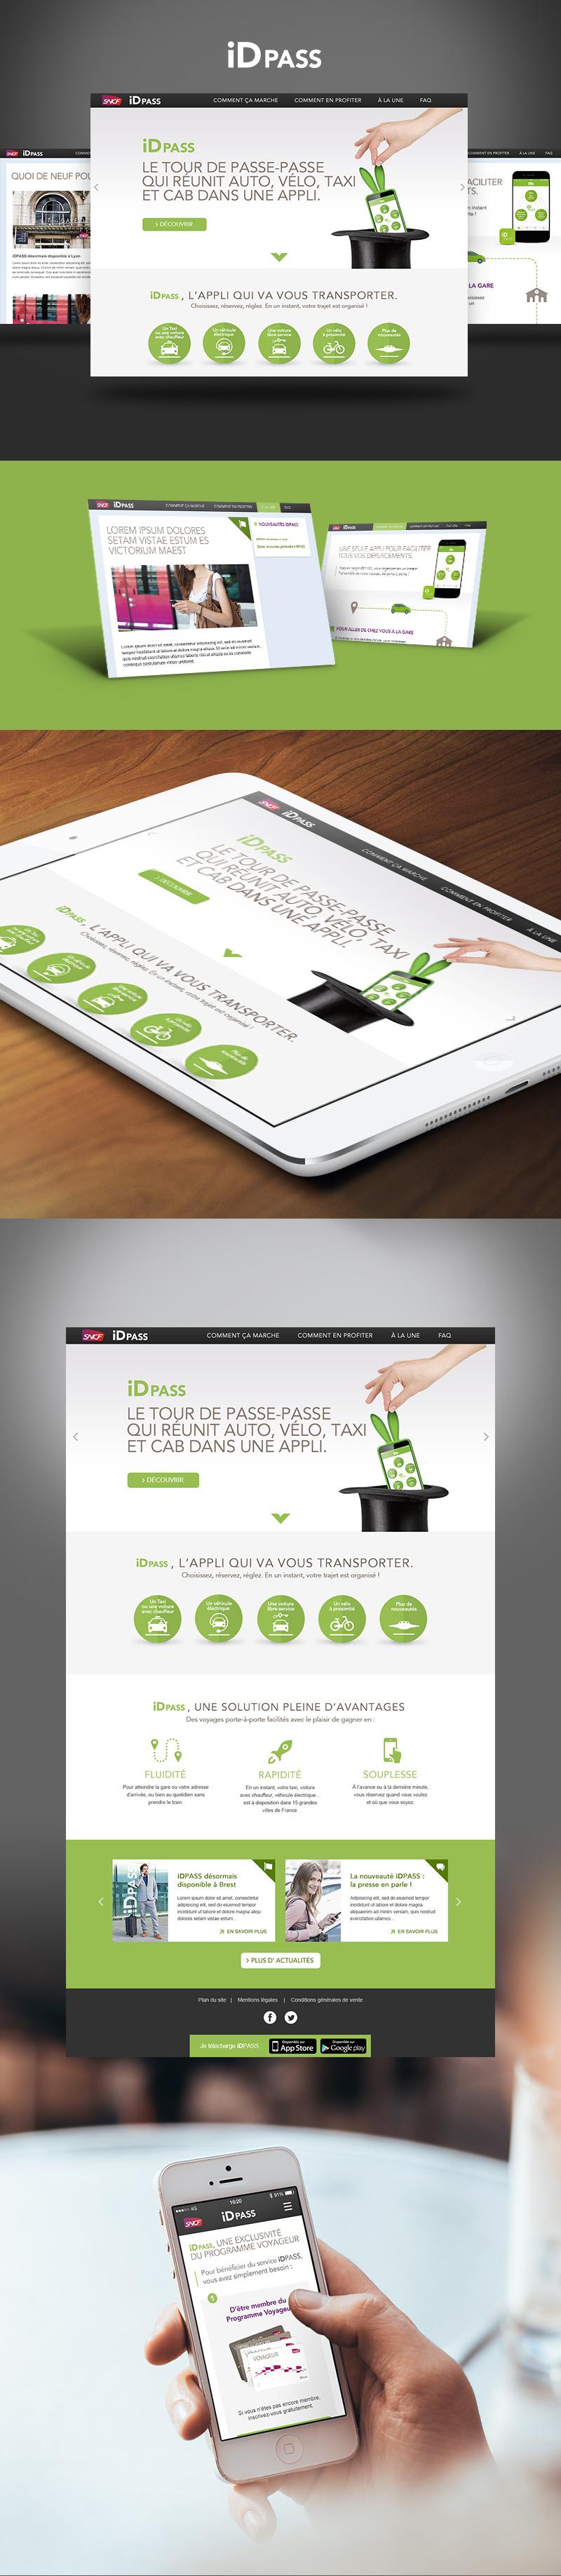 Directeur artistique freelance - SNCF IDPASS - Site internet